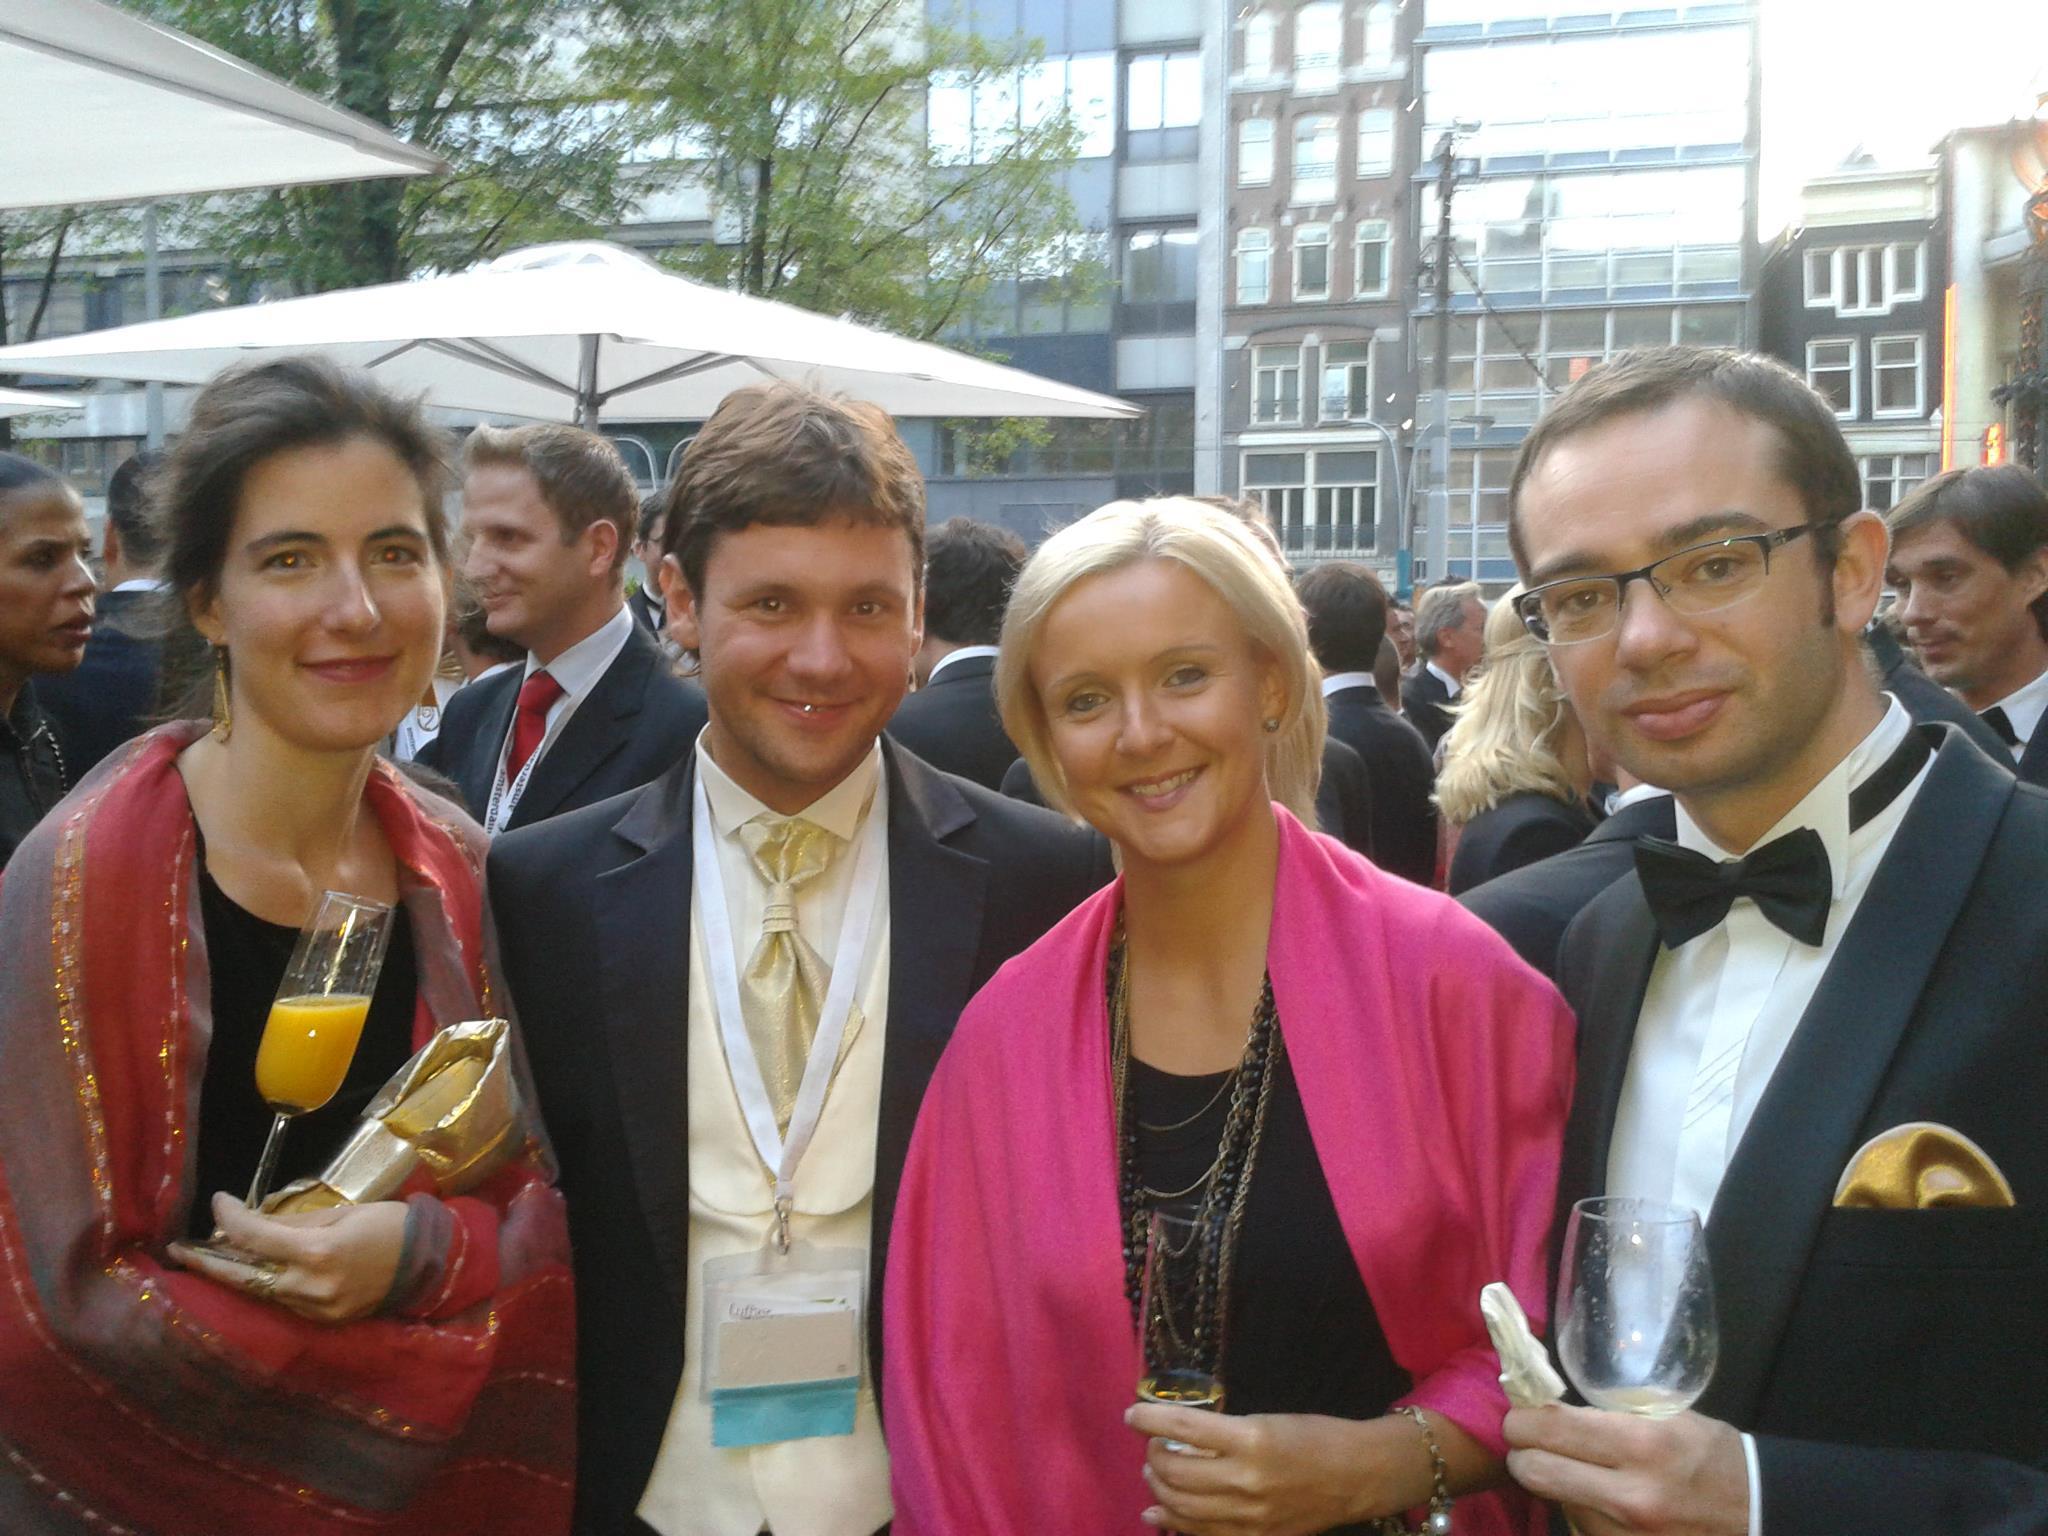 Amsterdam 2011, kongres AIJA - mezinárodní asociace mladých právníků (www.aija.org)